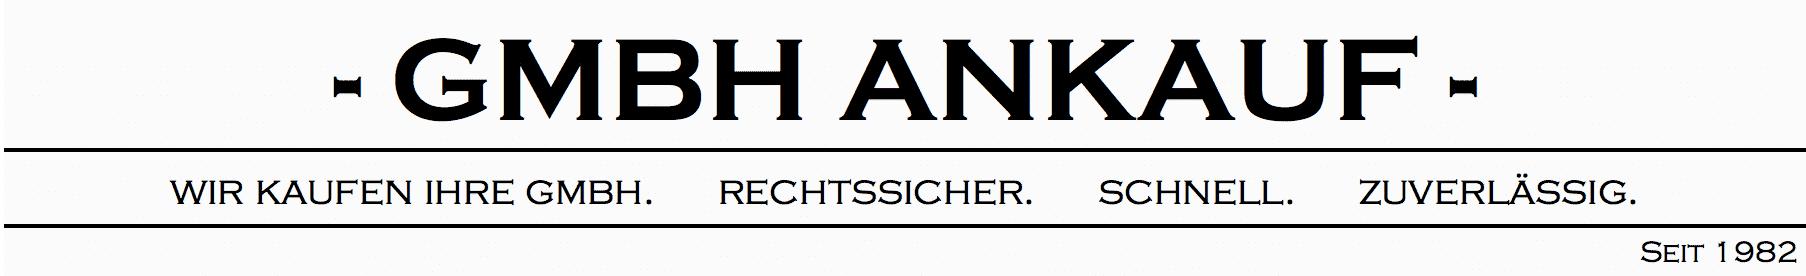 GMBH MANAGEMENT Logo